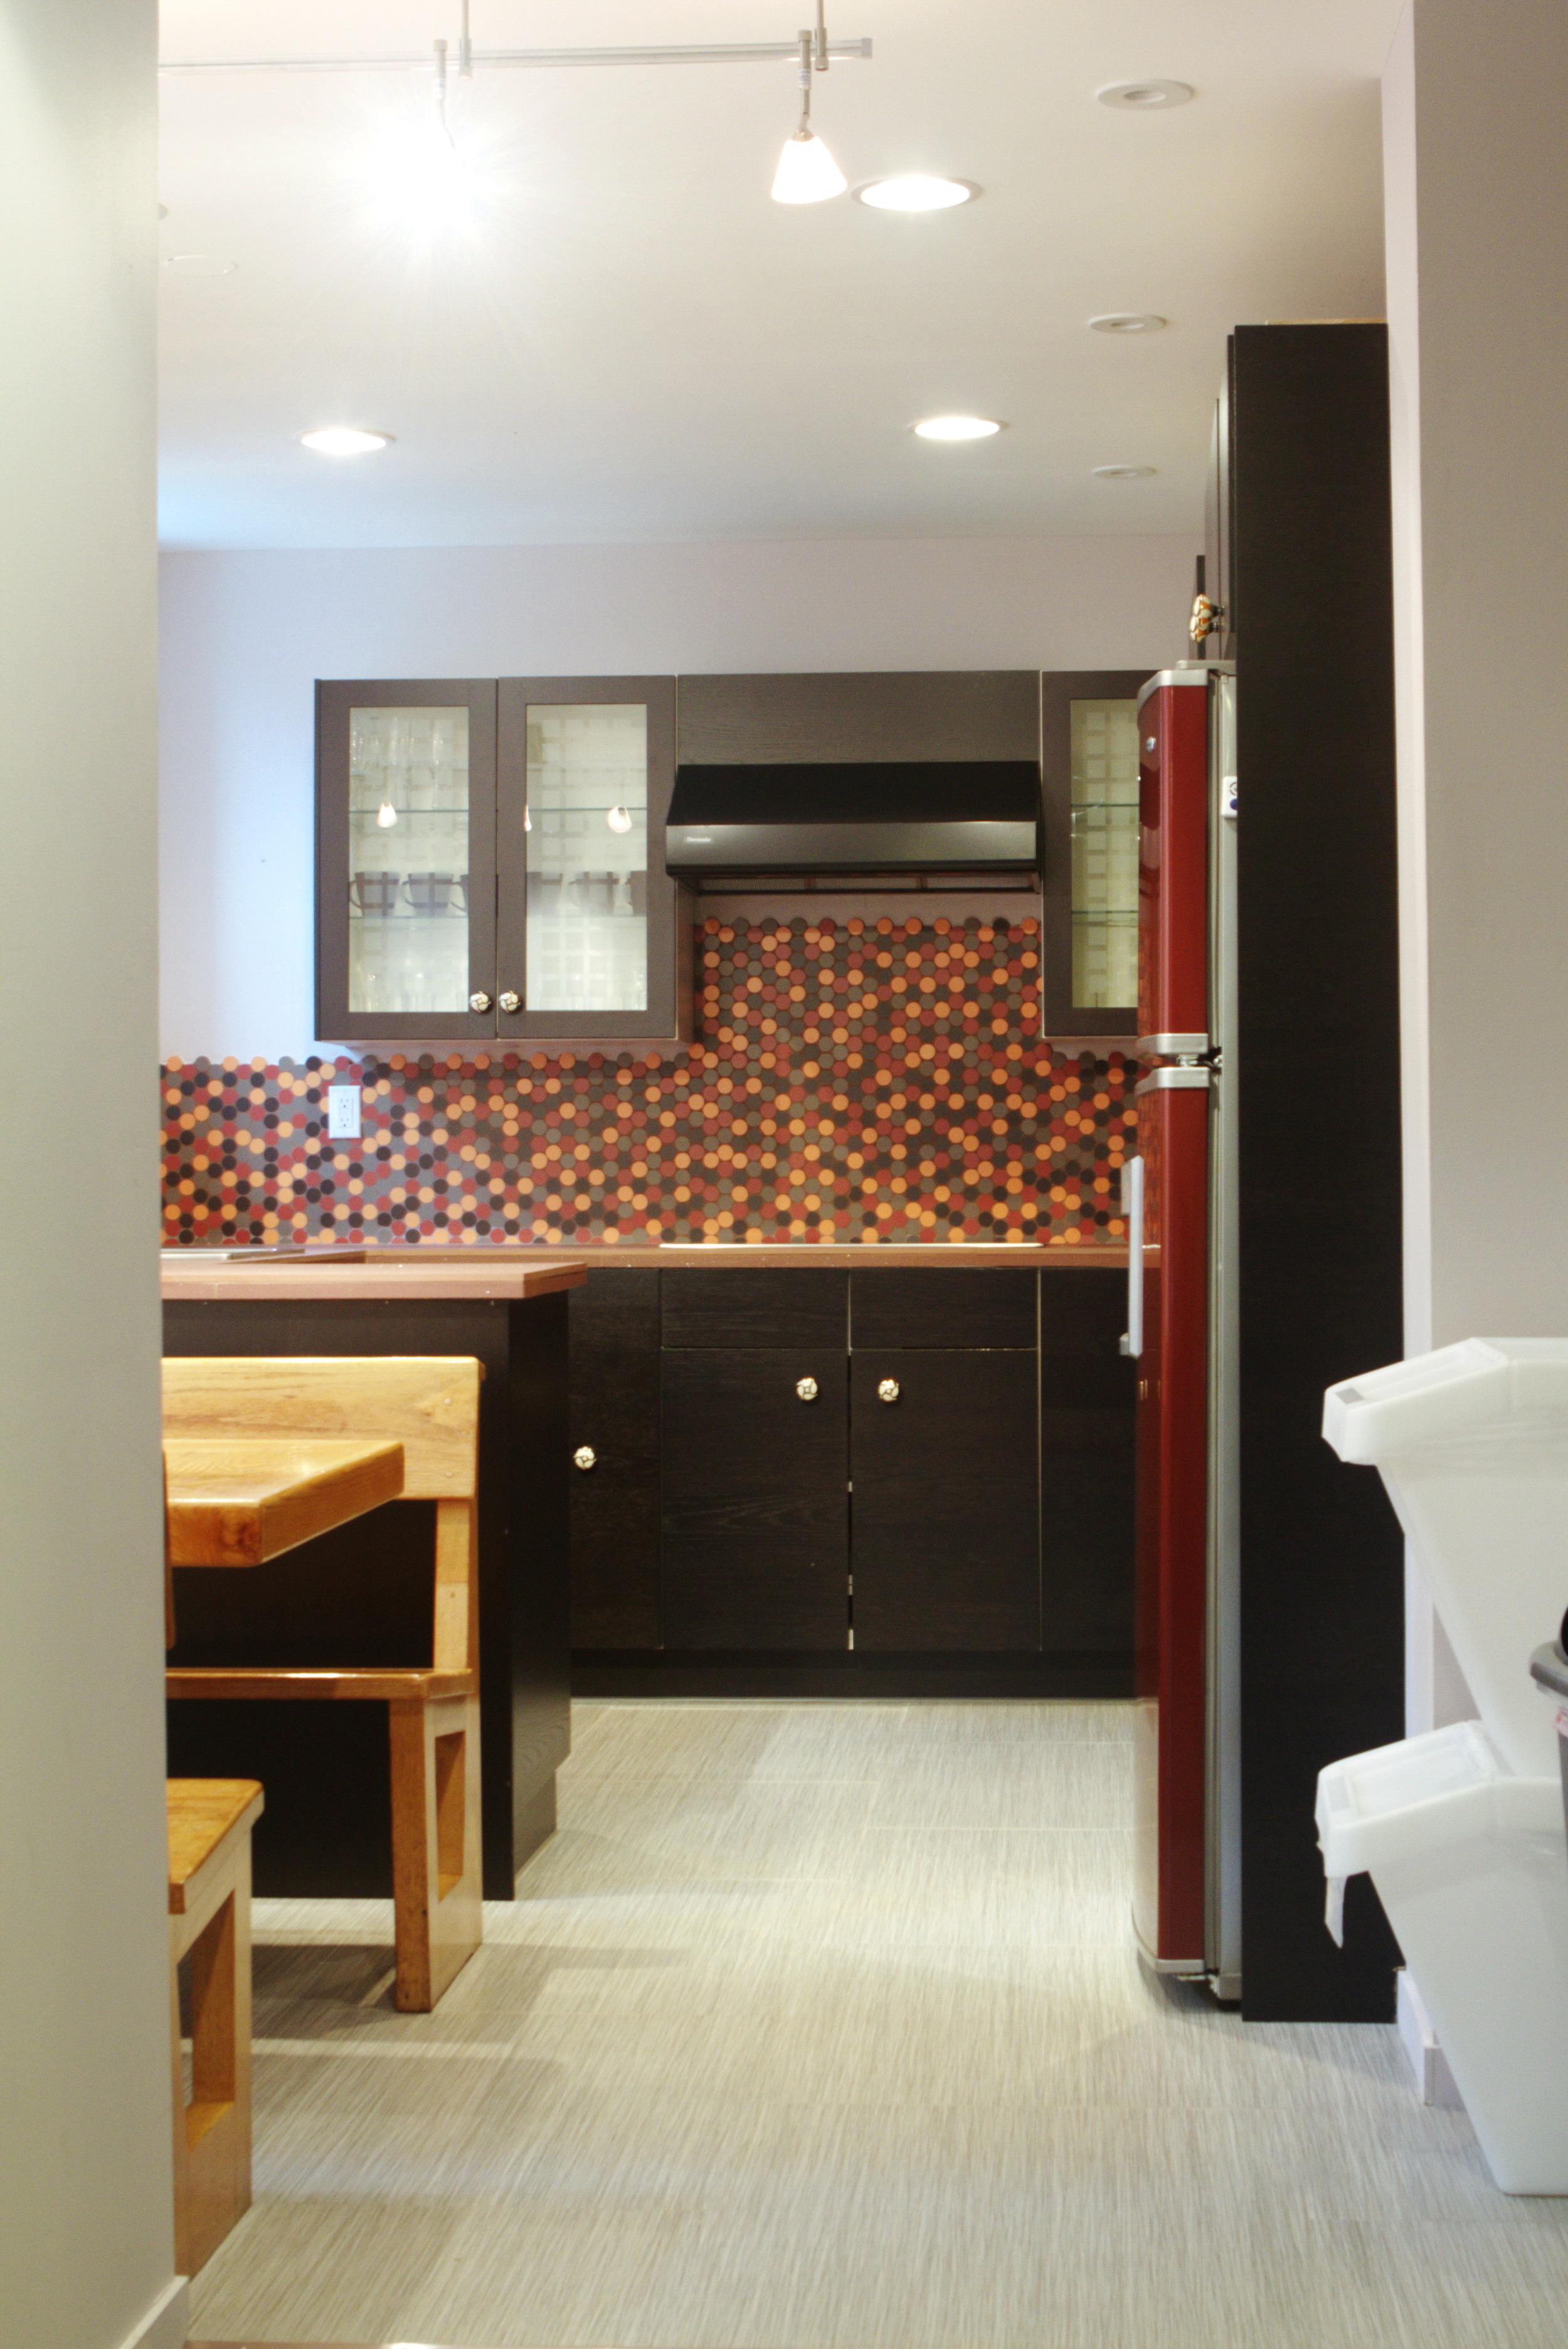 Architecture Photography: Kitchen